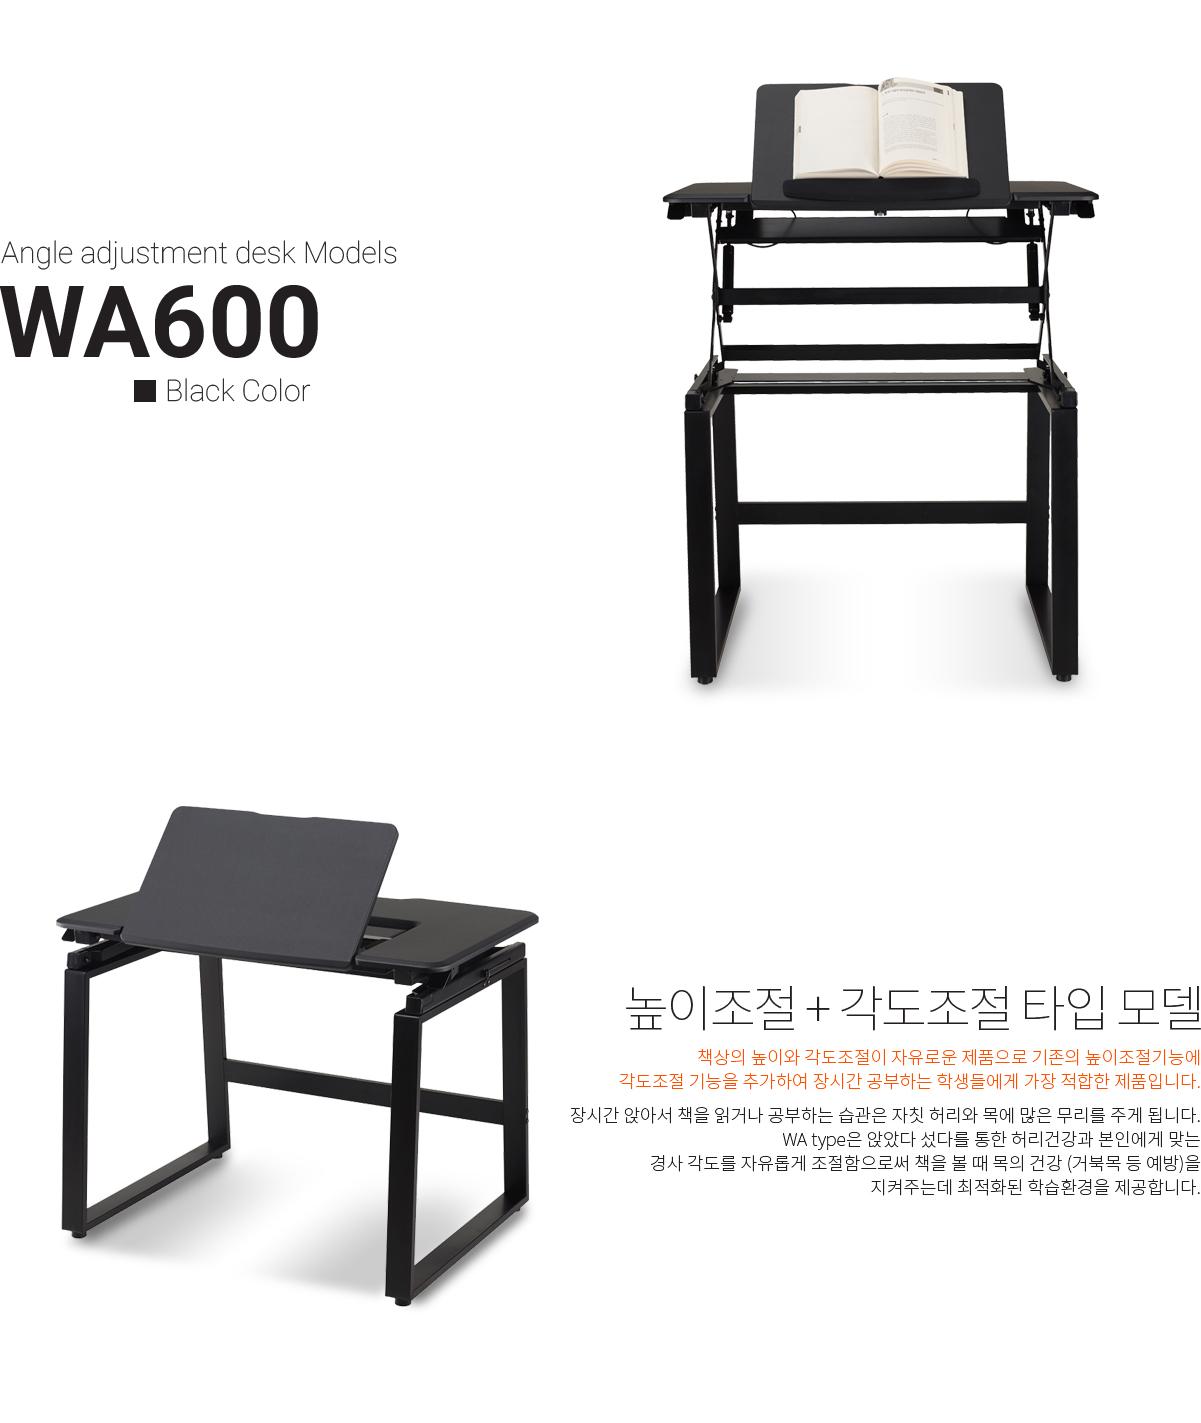 wa600_2.jpg